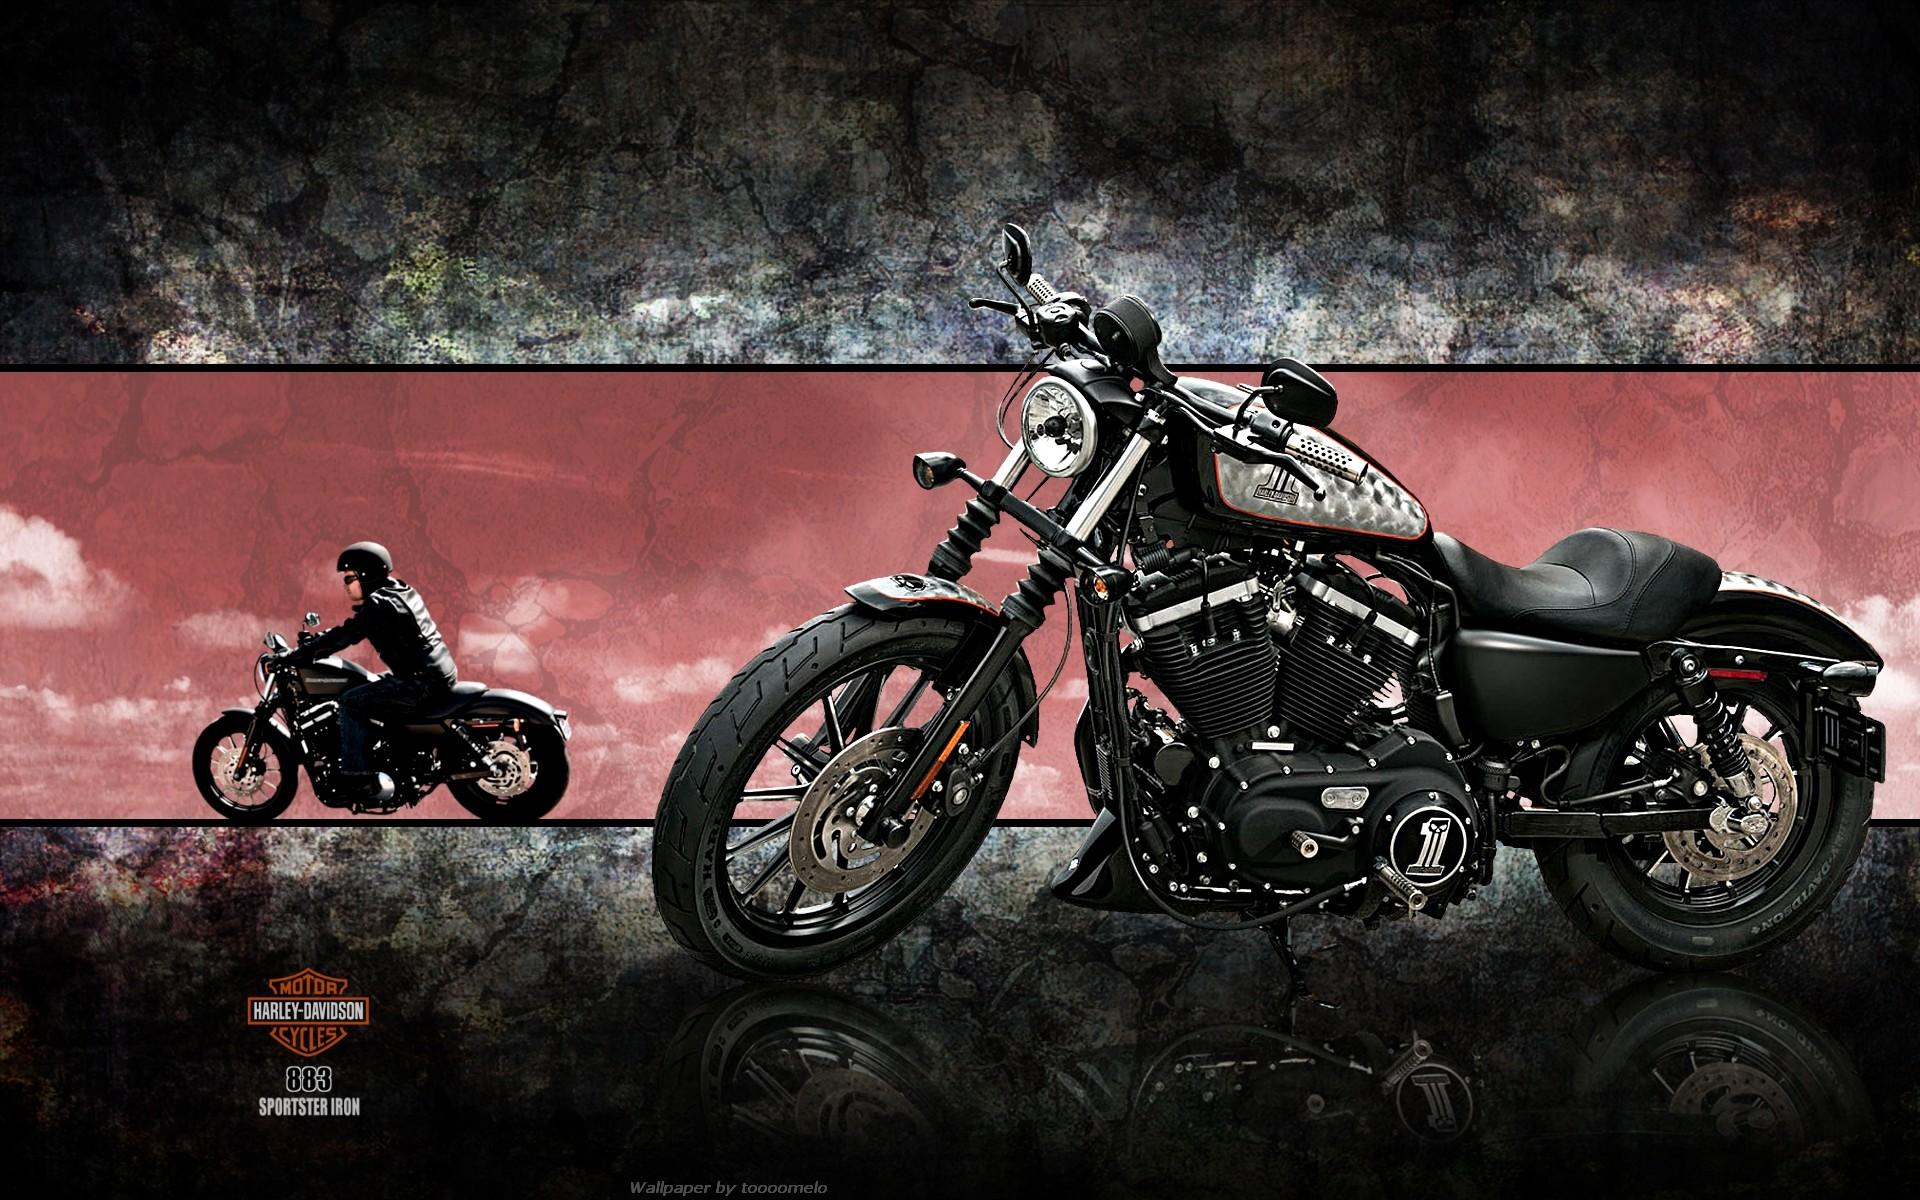 Harley Davidson Wallpapers And Screensavers (80+ Images